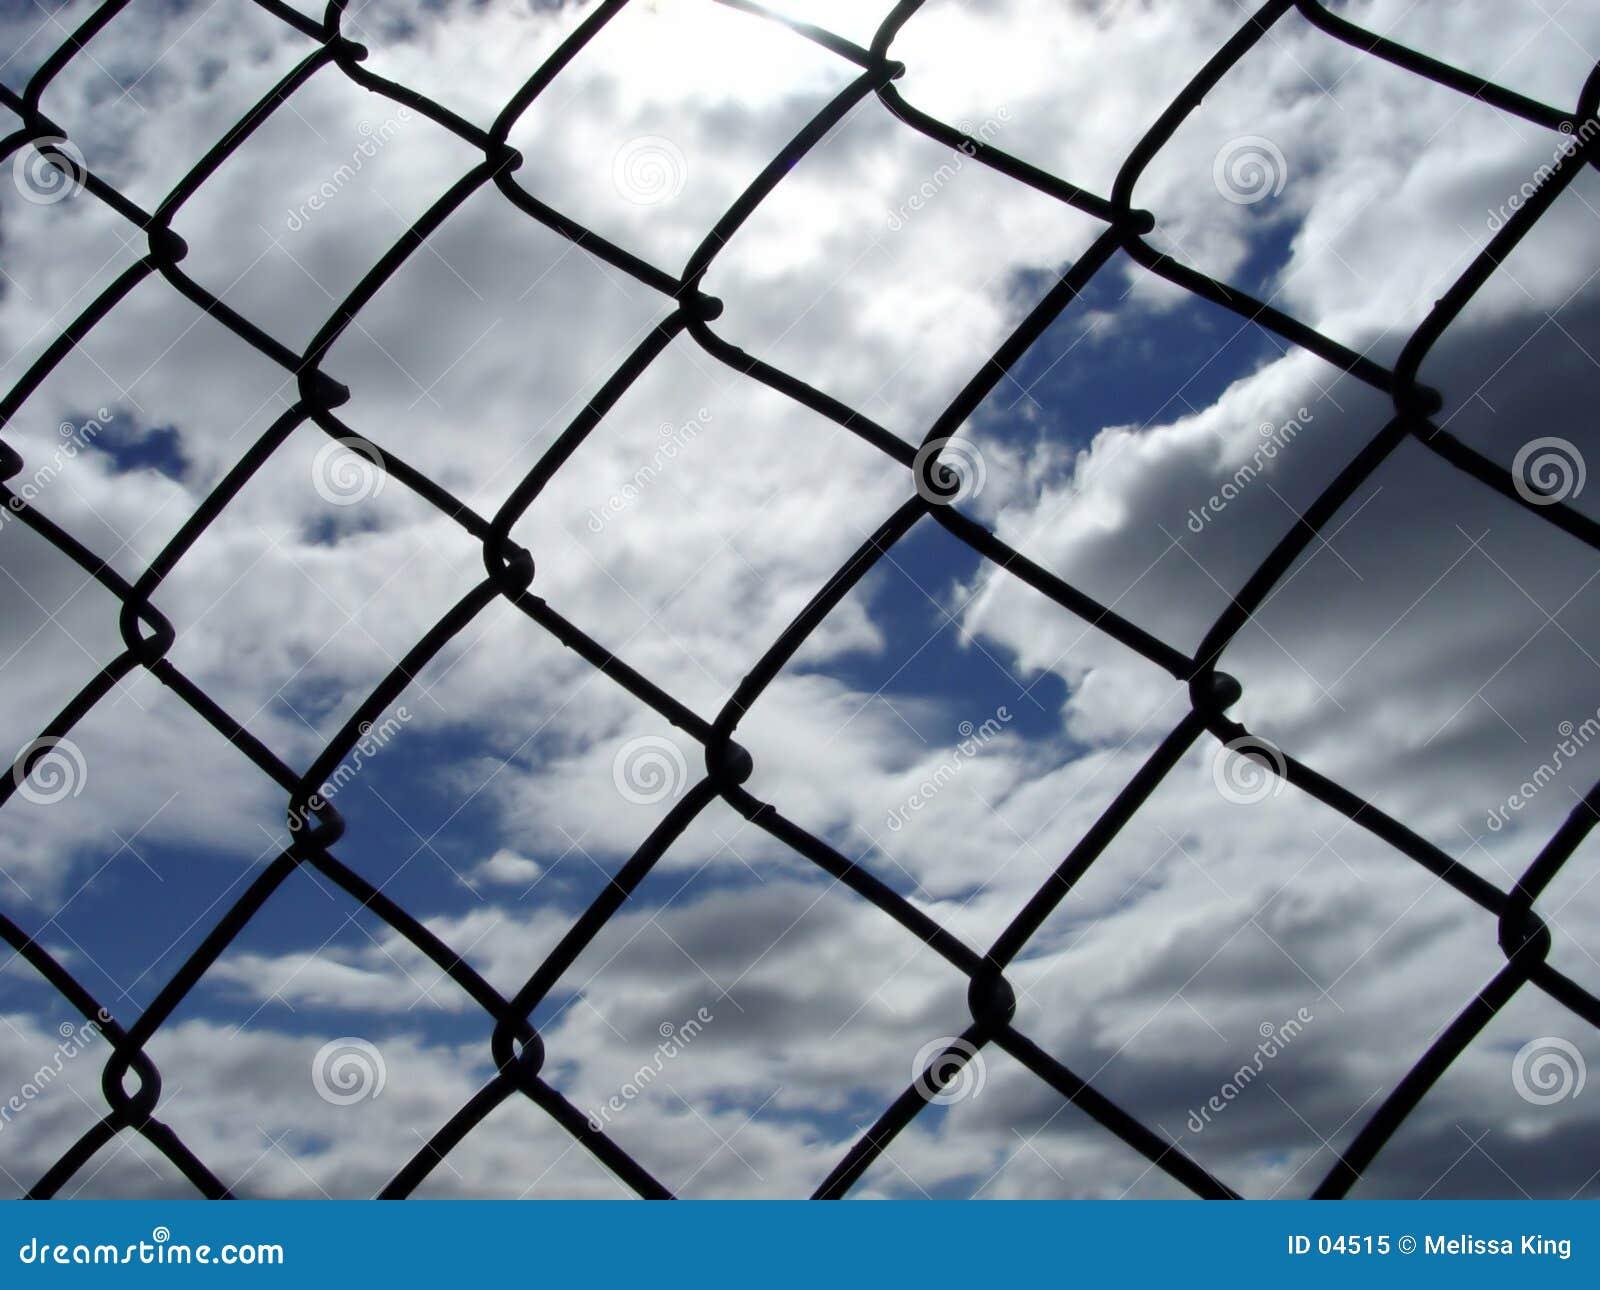 Zwar ein Zaun